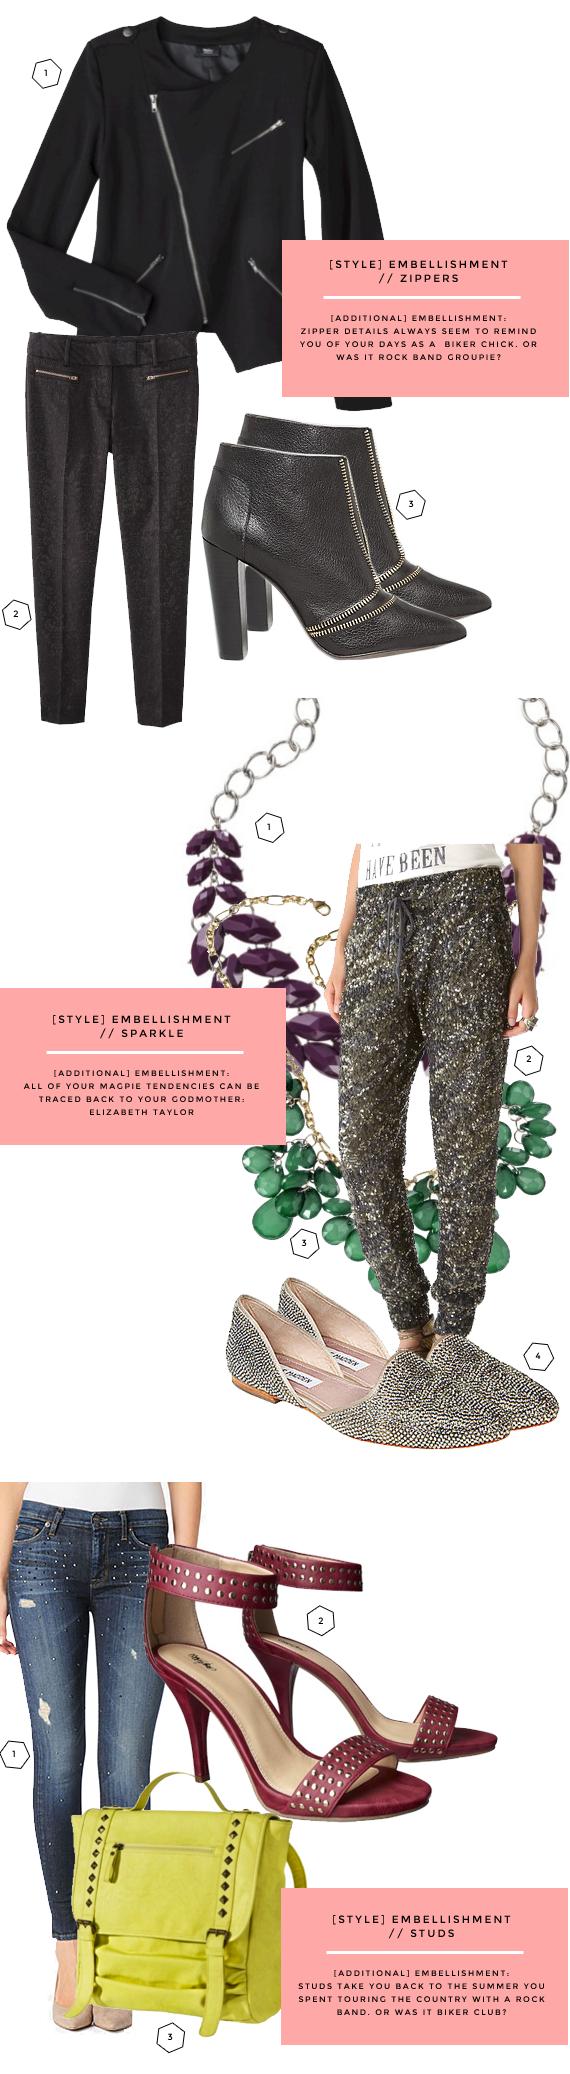 target fall style embellishment